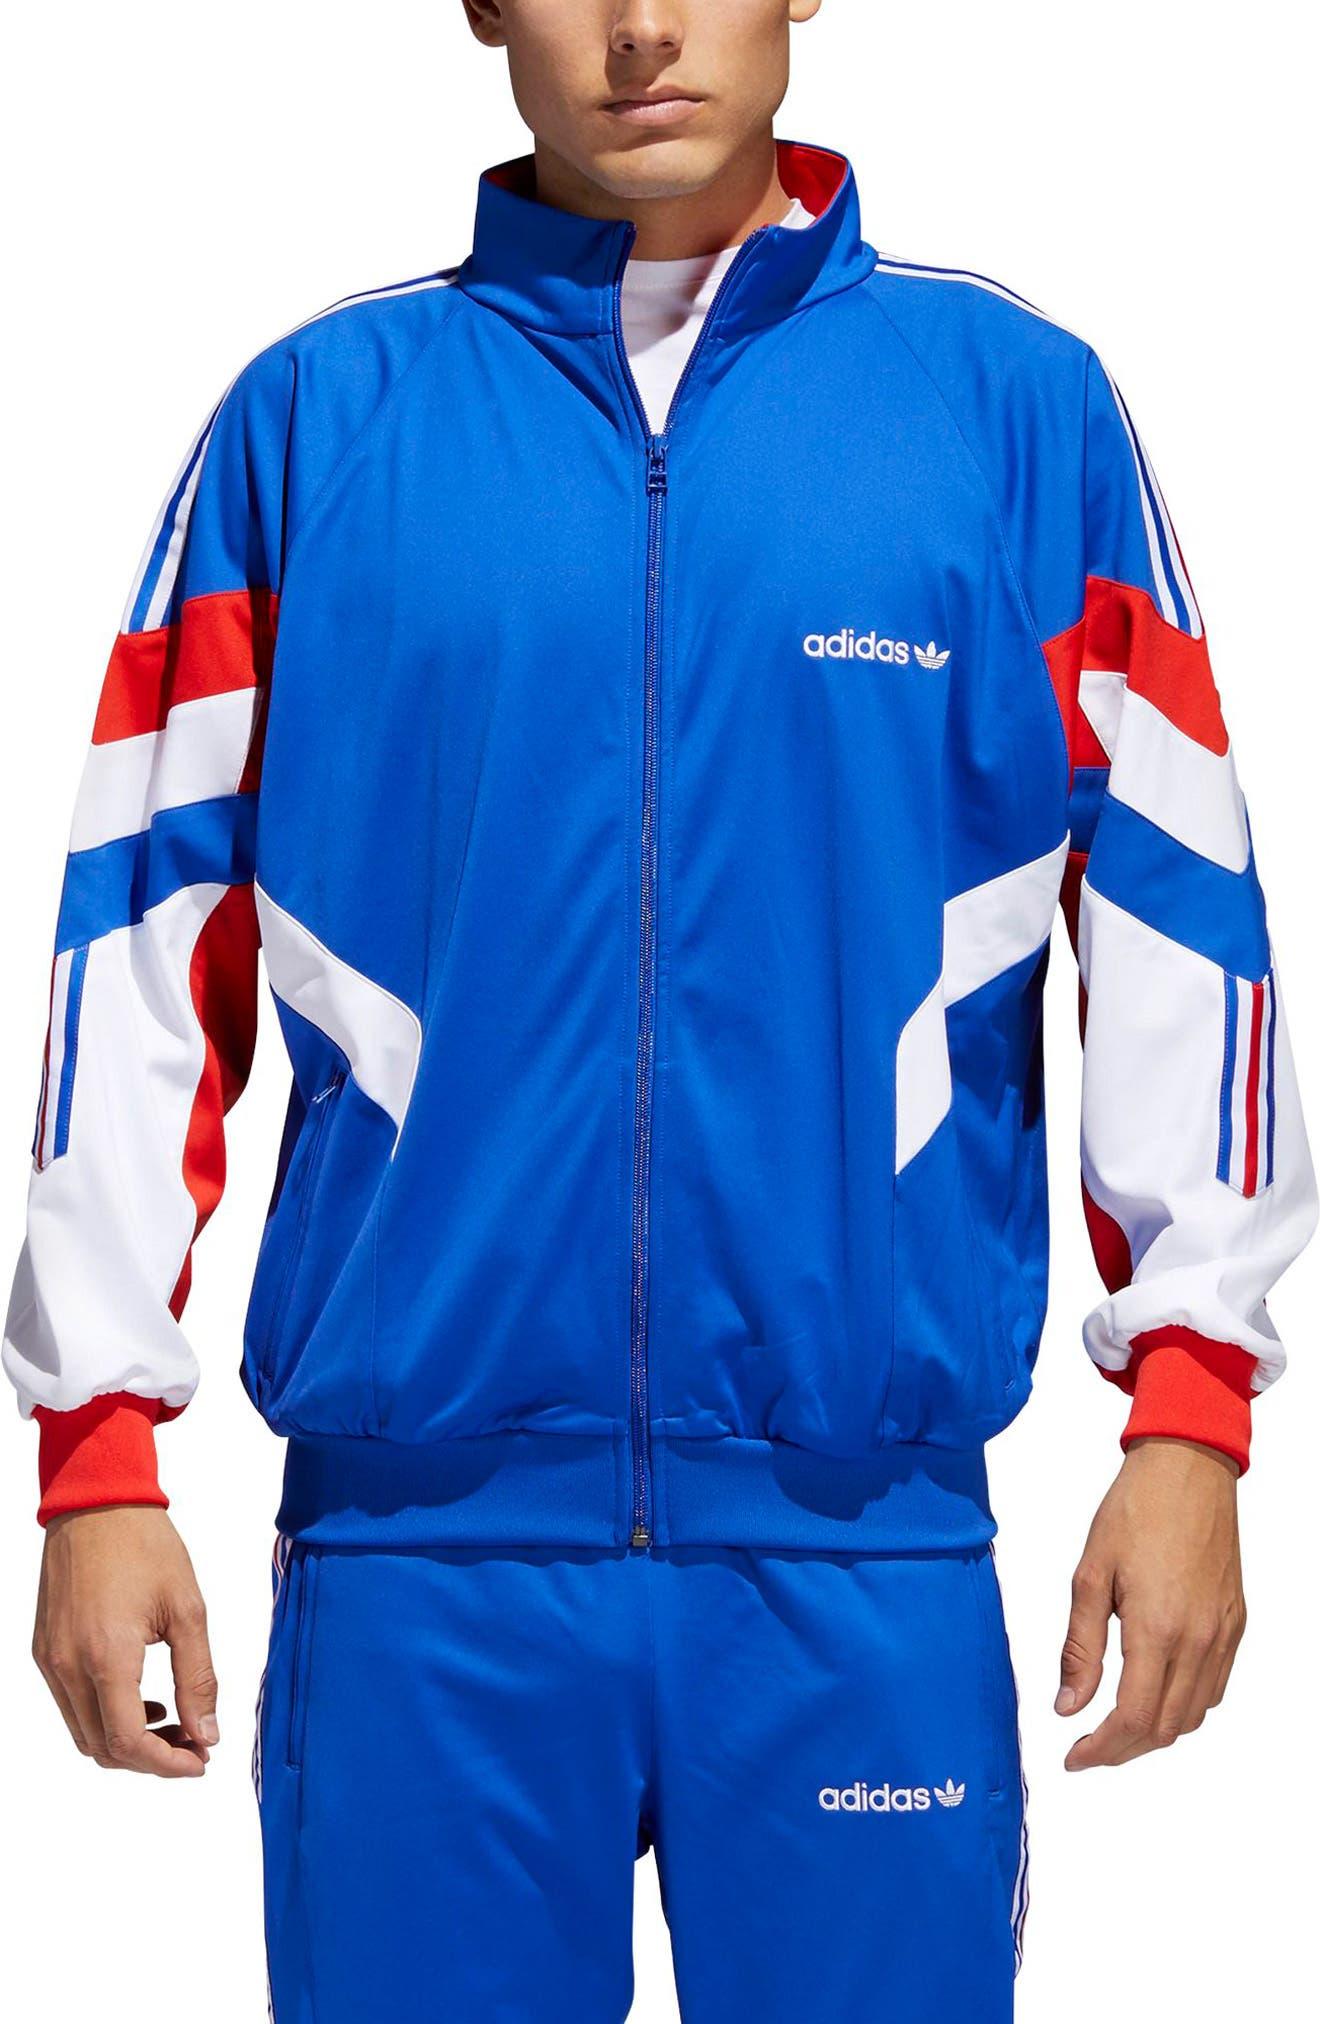 Aloxe Track Jacket,                             Main thumbnail 1, color,                             BOLD BLUE/ WHITE